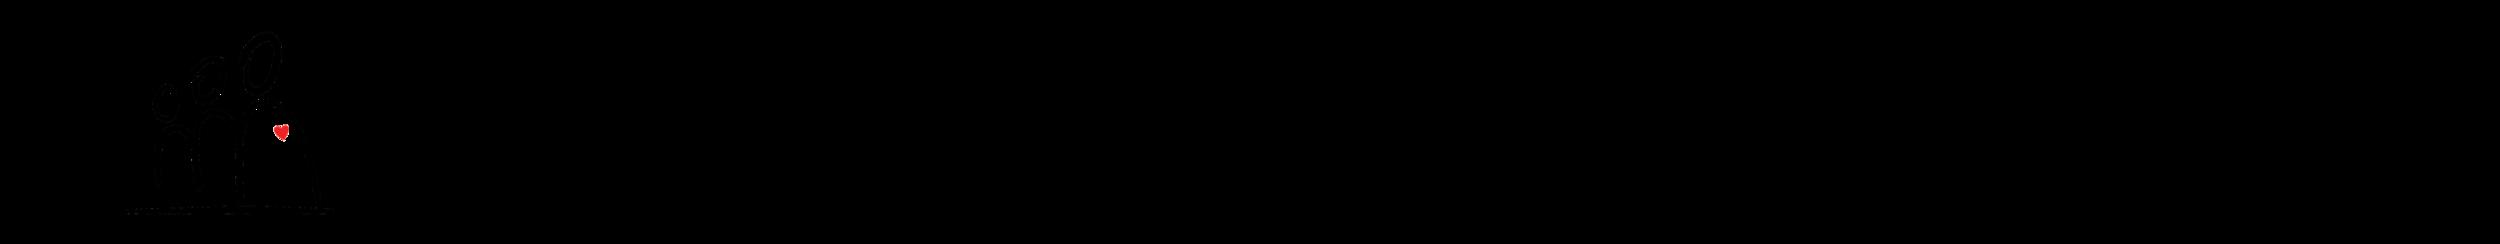 black logo text.png